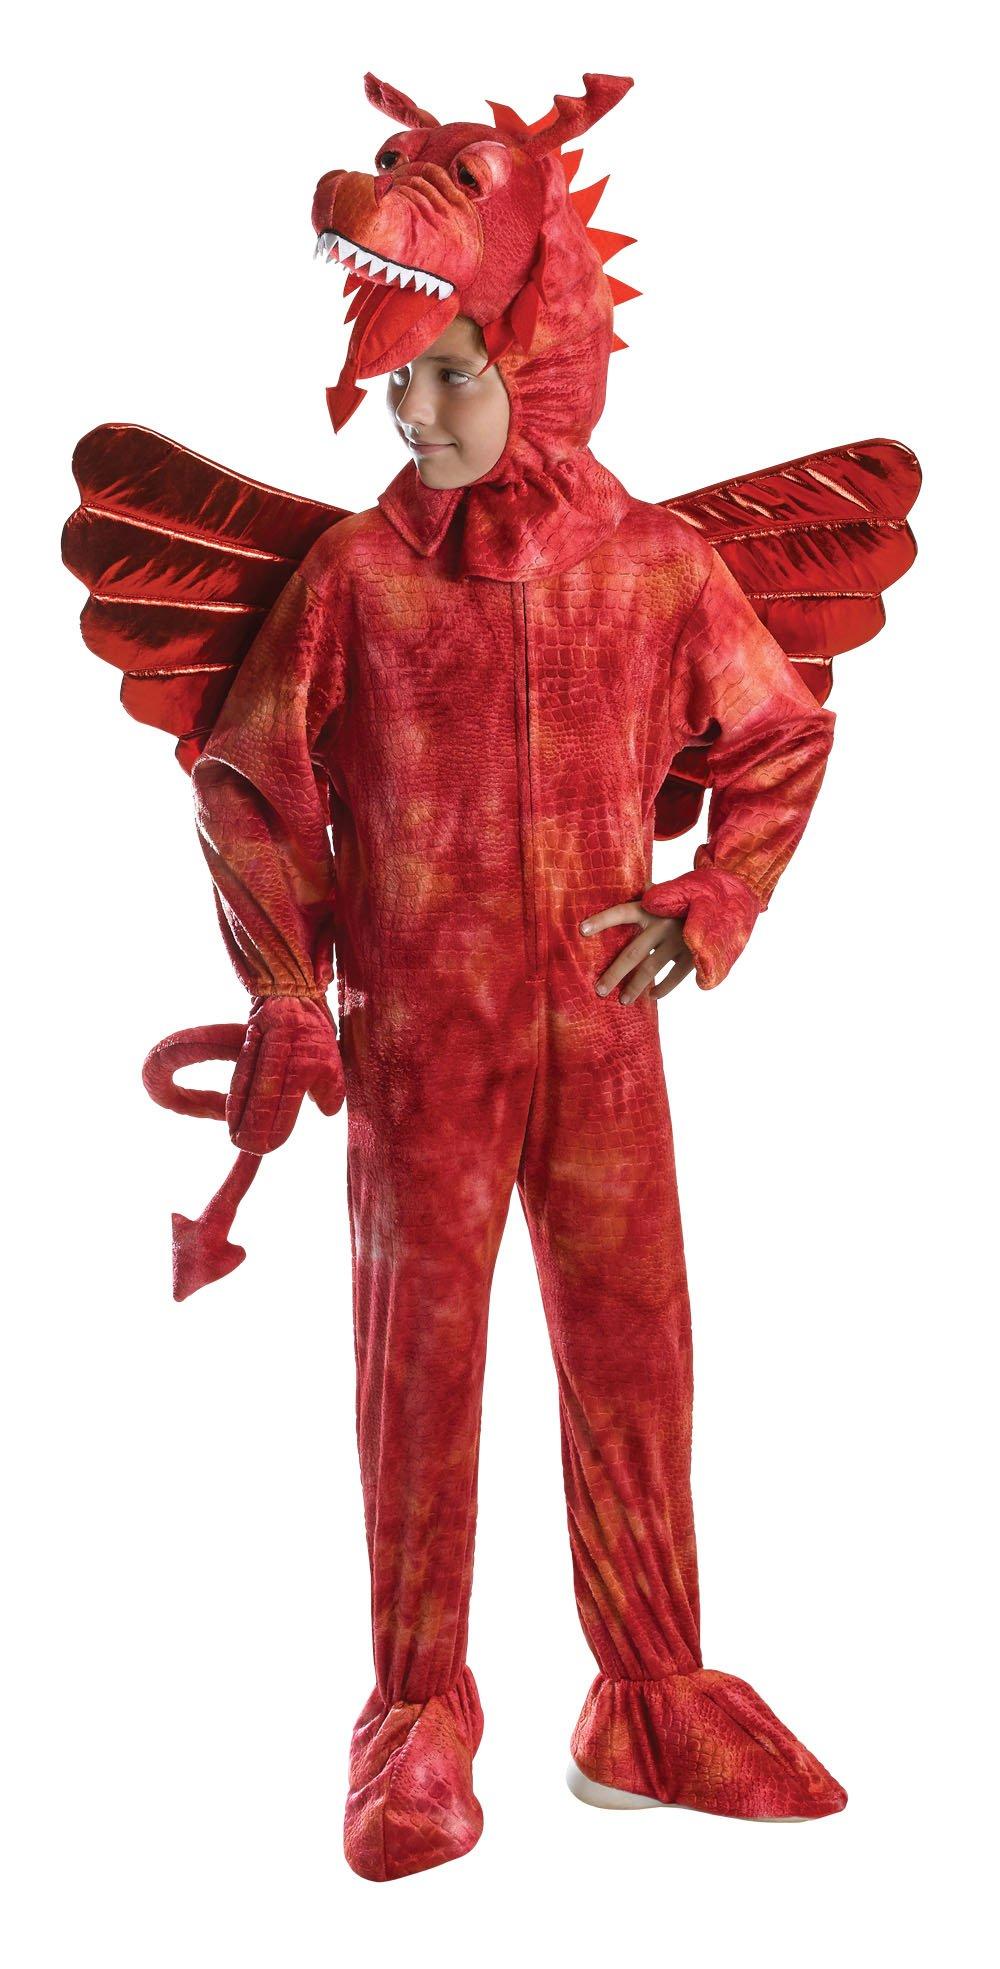 Bristol Novelty CC572 Dragon Costume Red Medium 128 cm Approx Age 5  sc 1 st  Amazon UK & Dragon Costumes: Amazon.co.uk